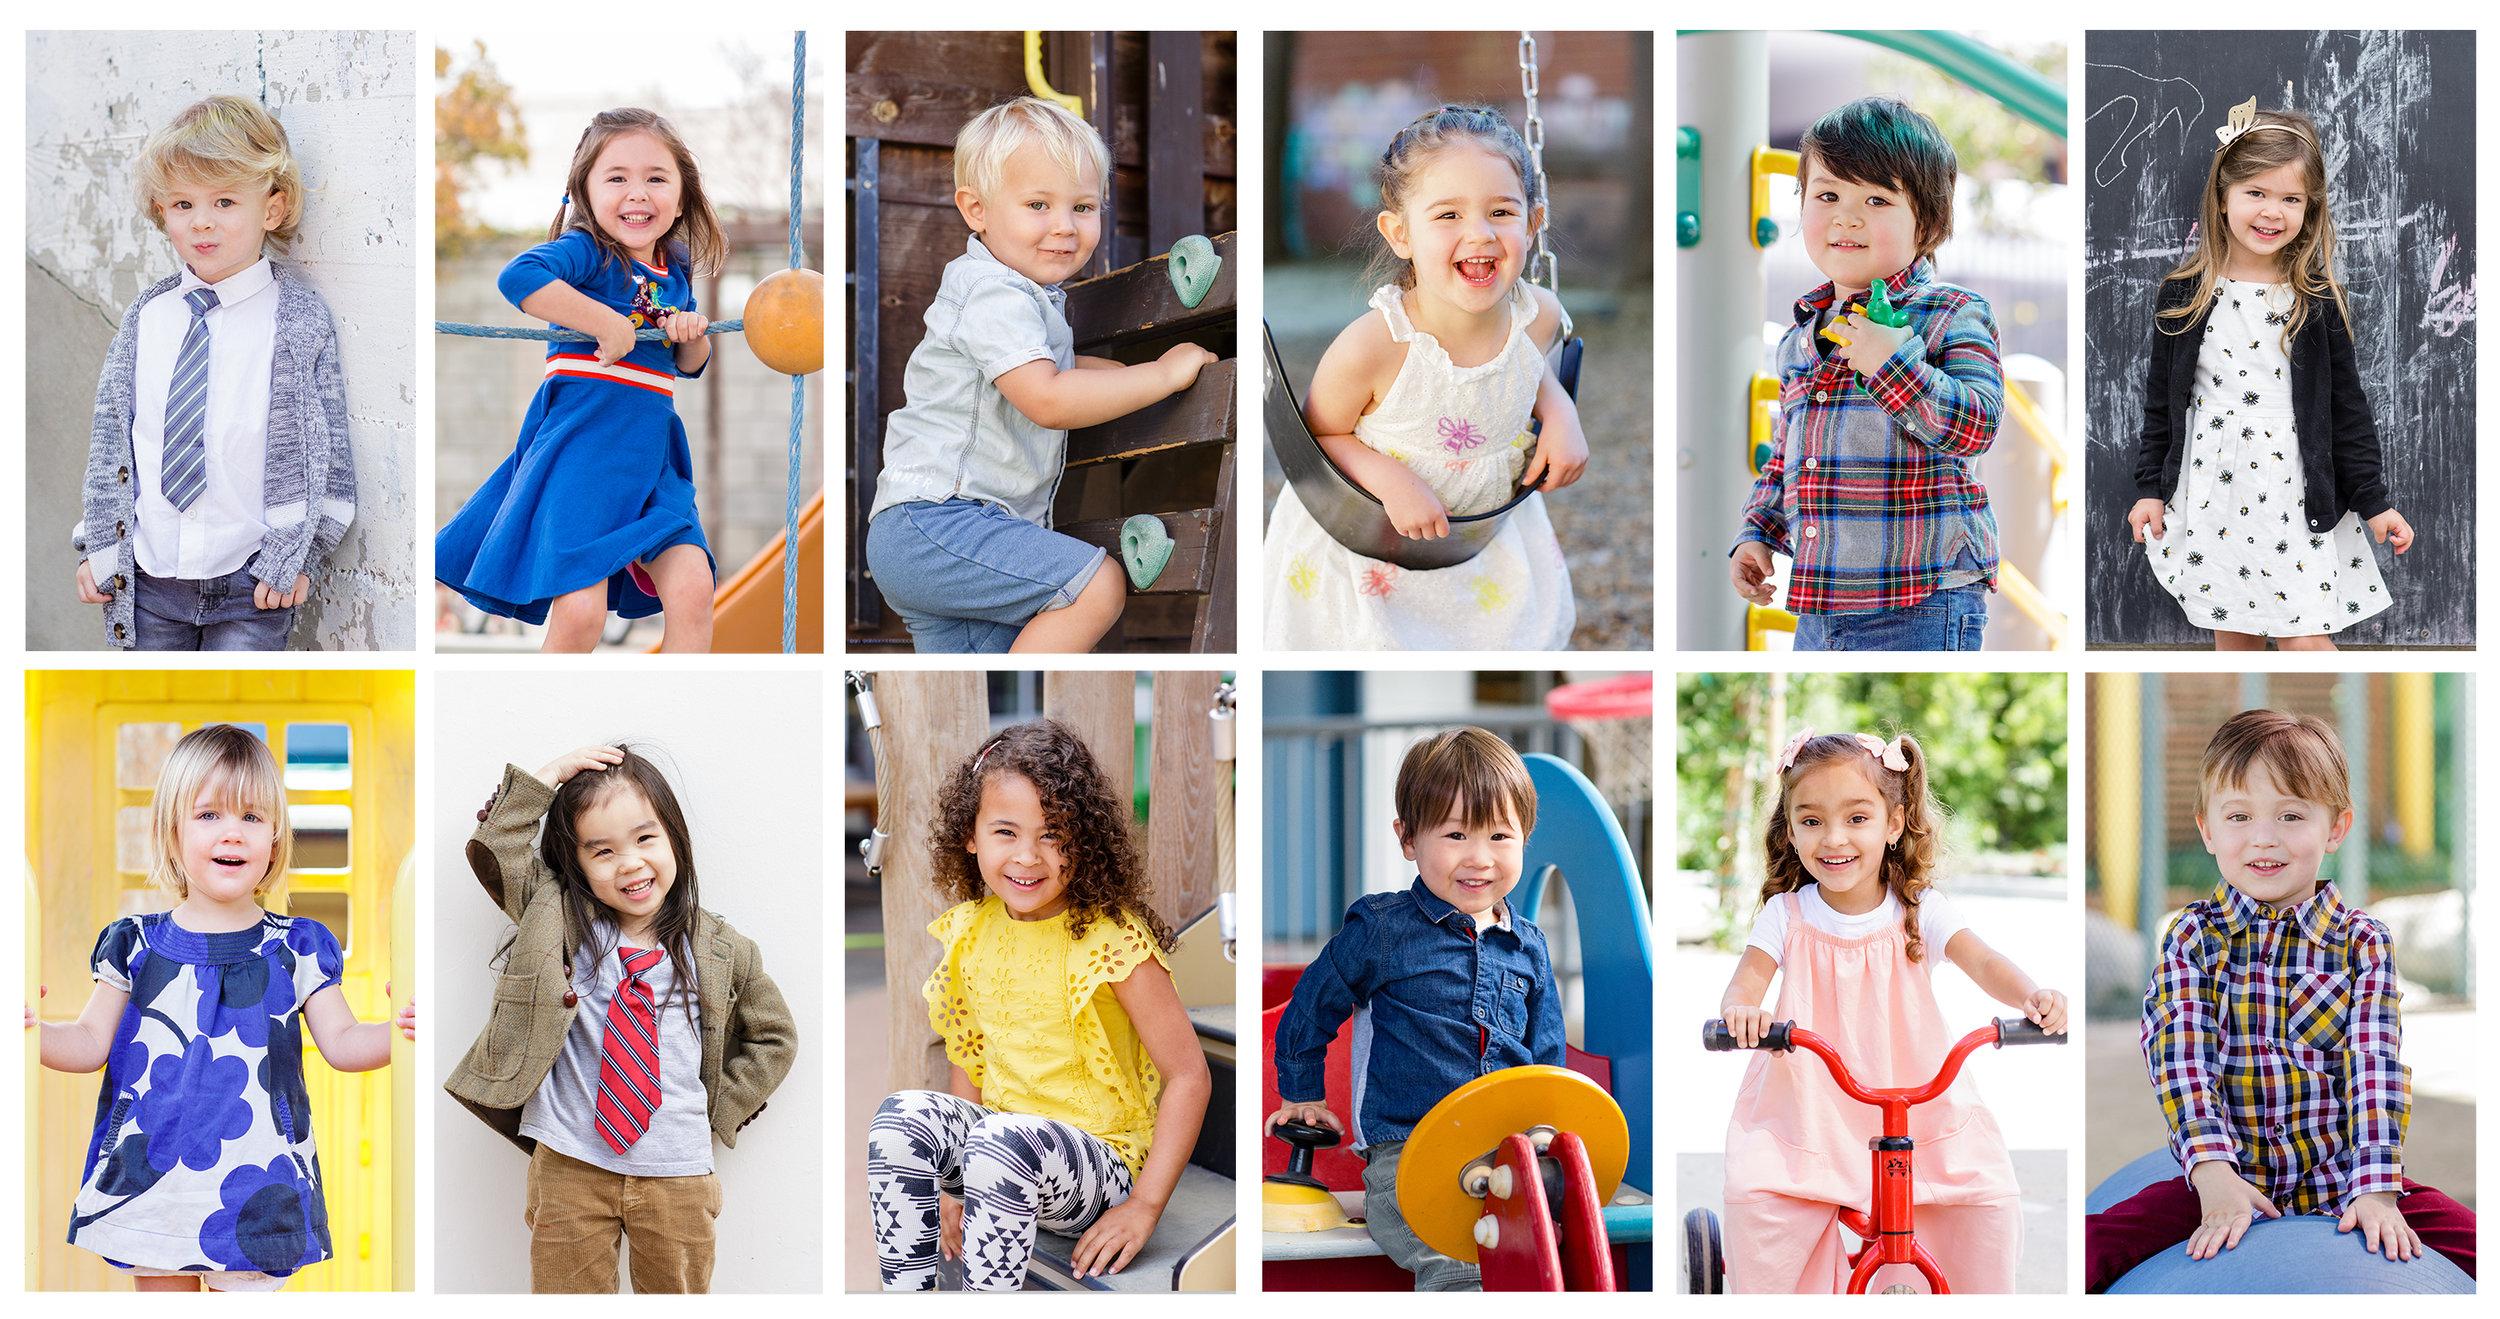 Preschool Collage.jpg